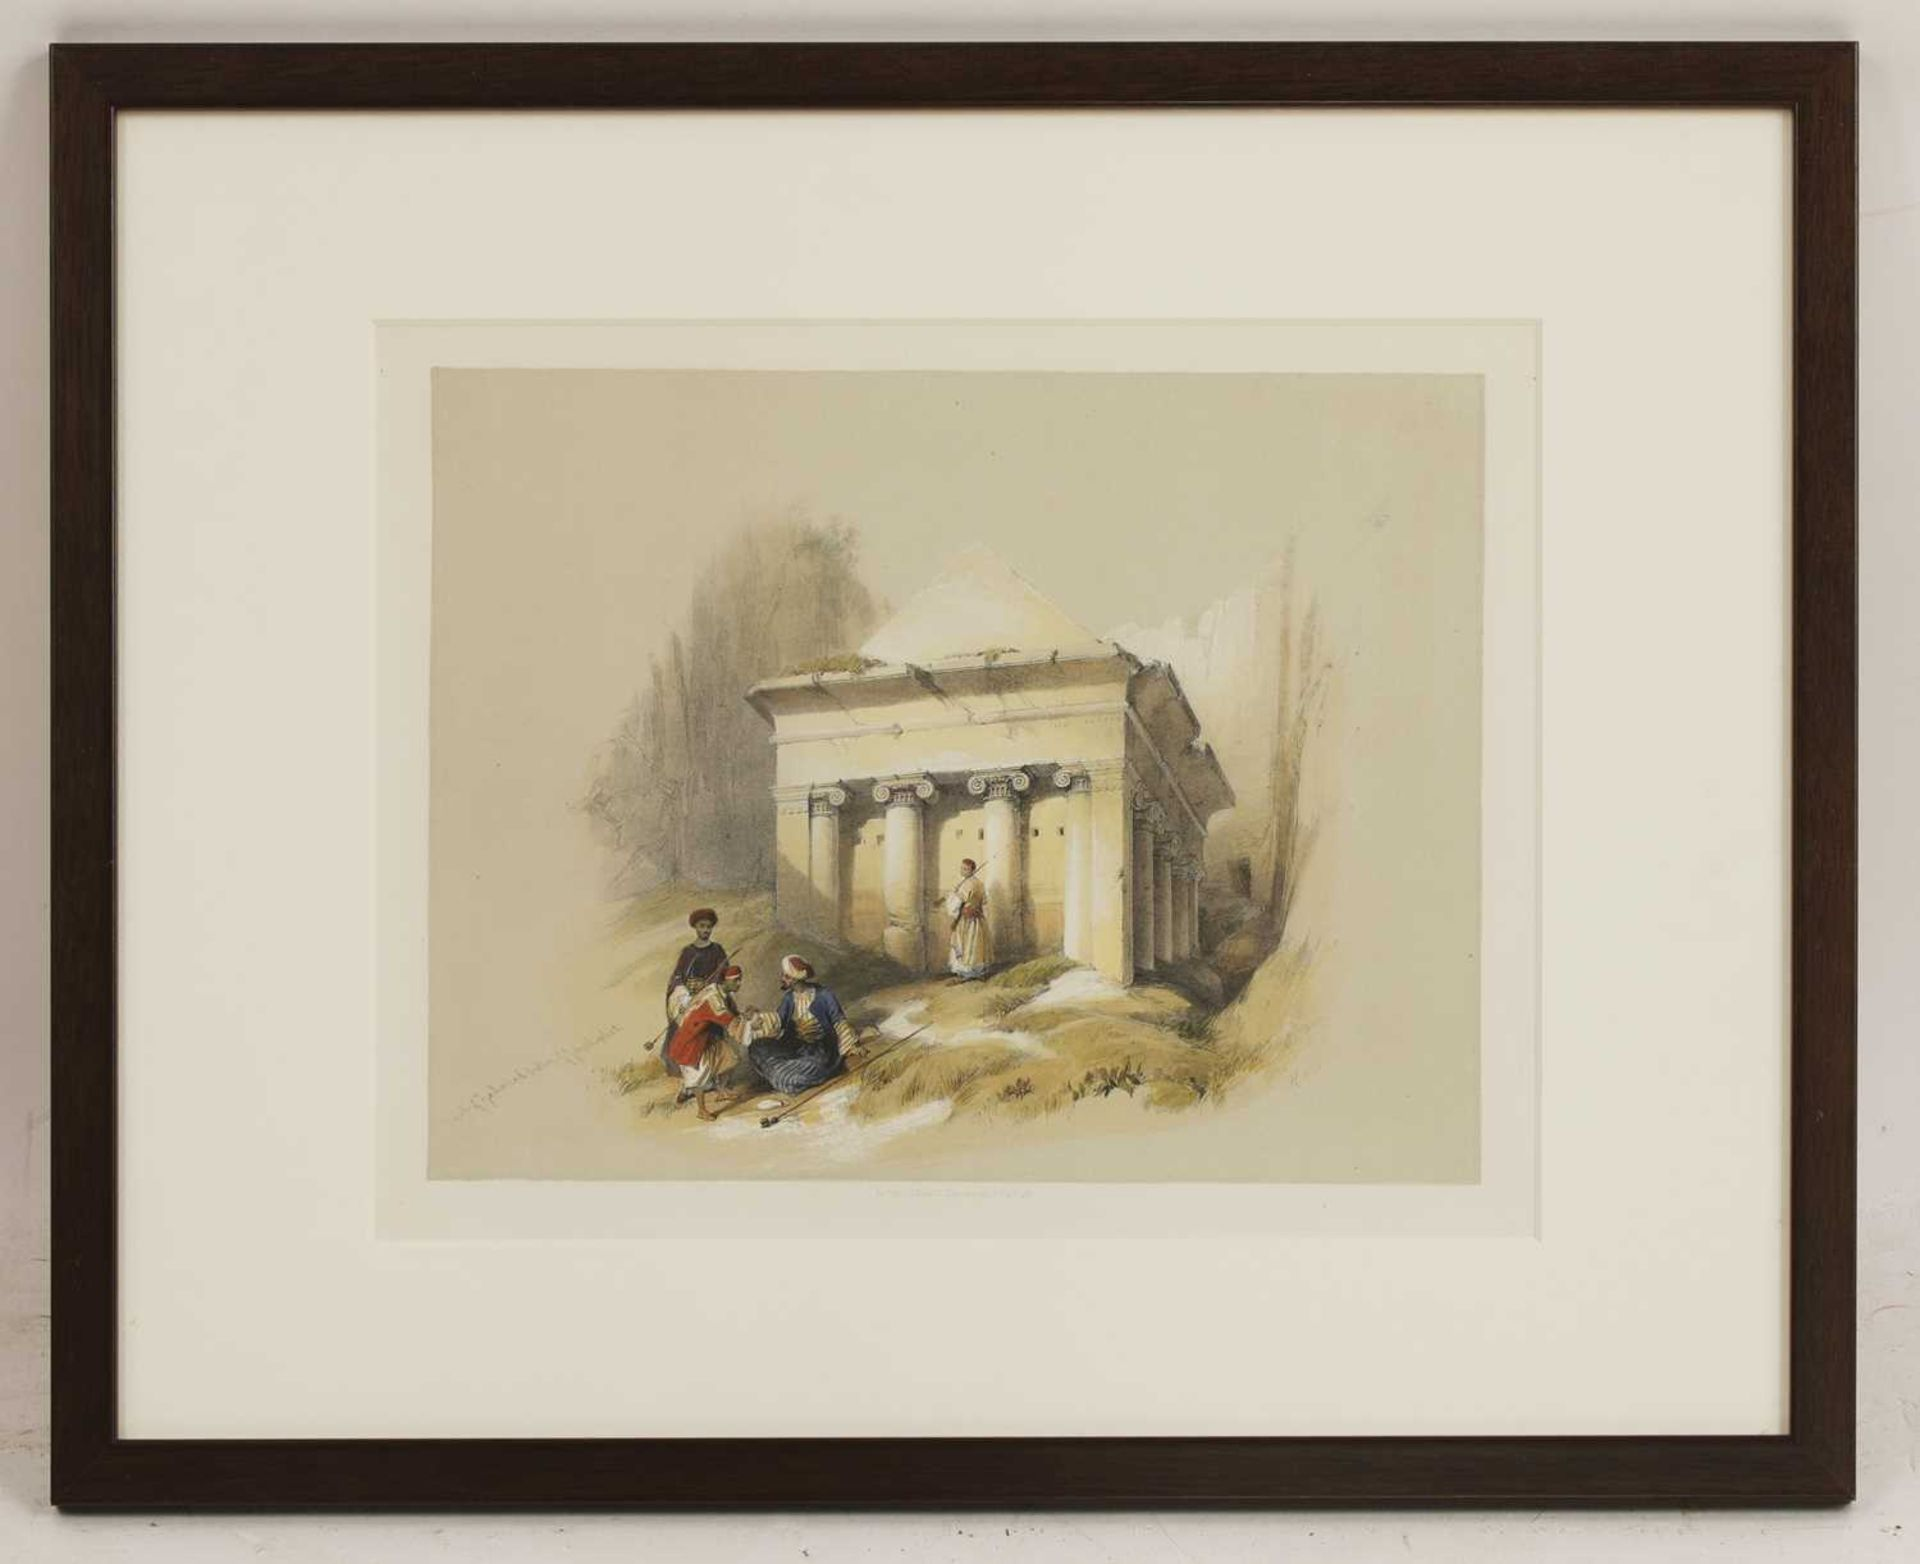 Louis Haghe after David Roberts RA (1796-1864) - Image 15 of 20